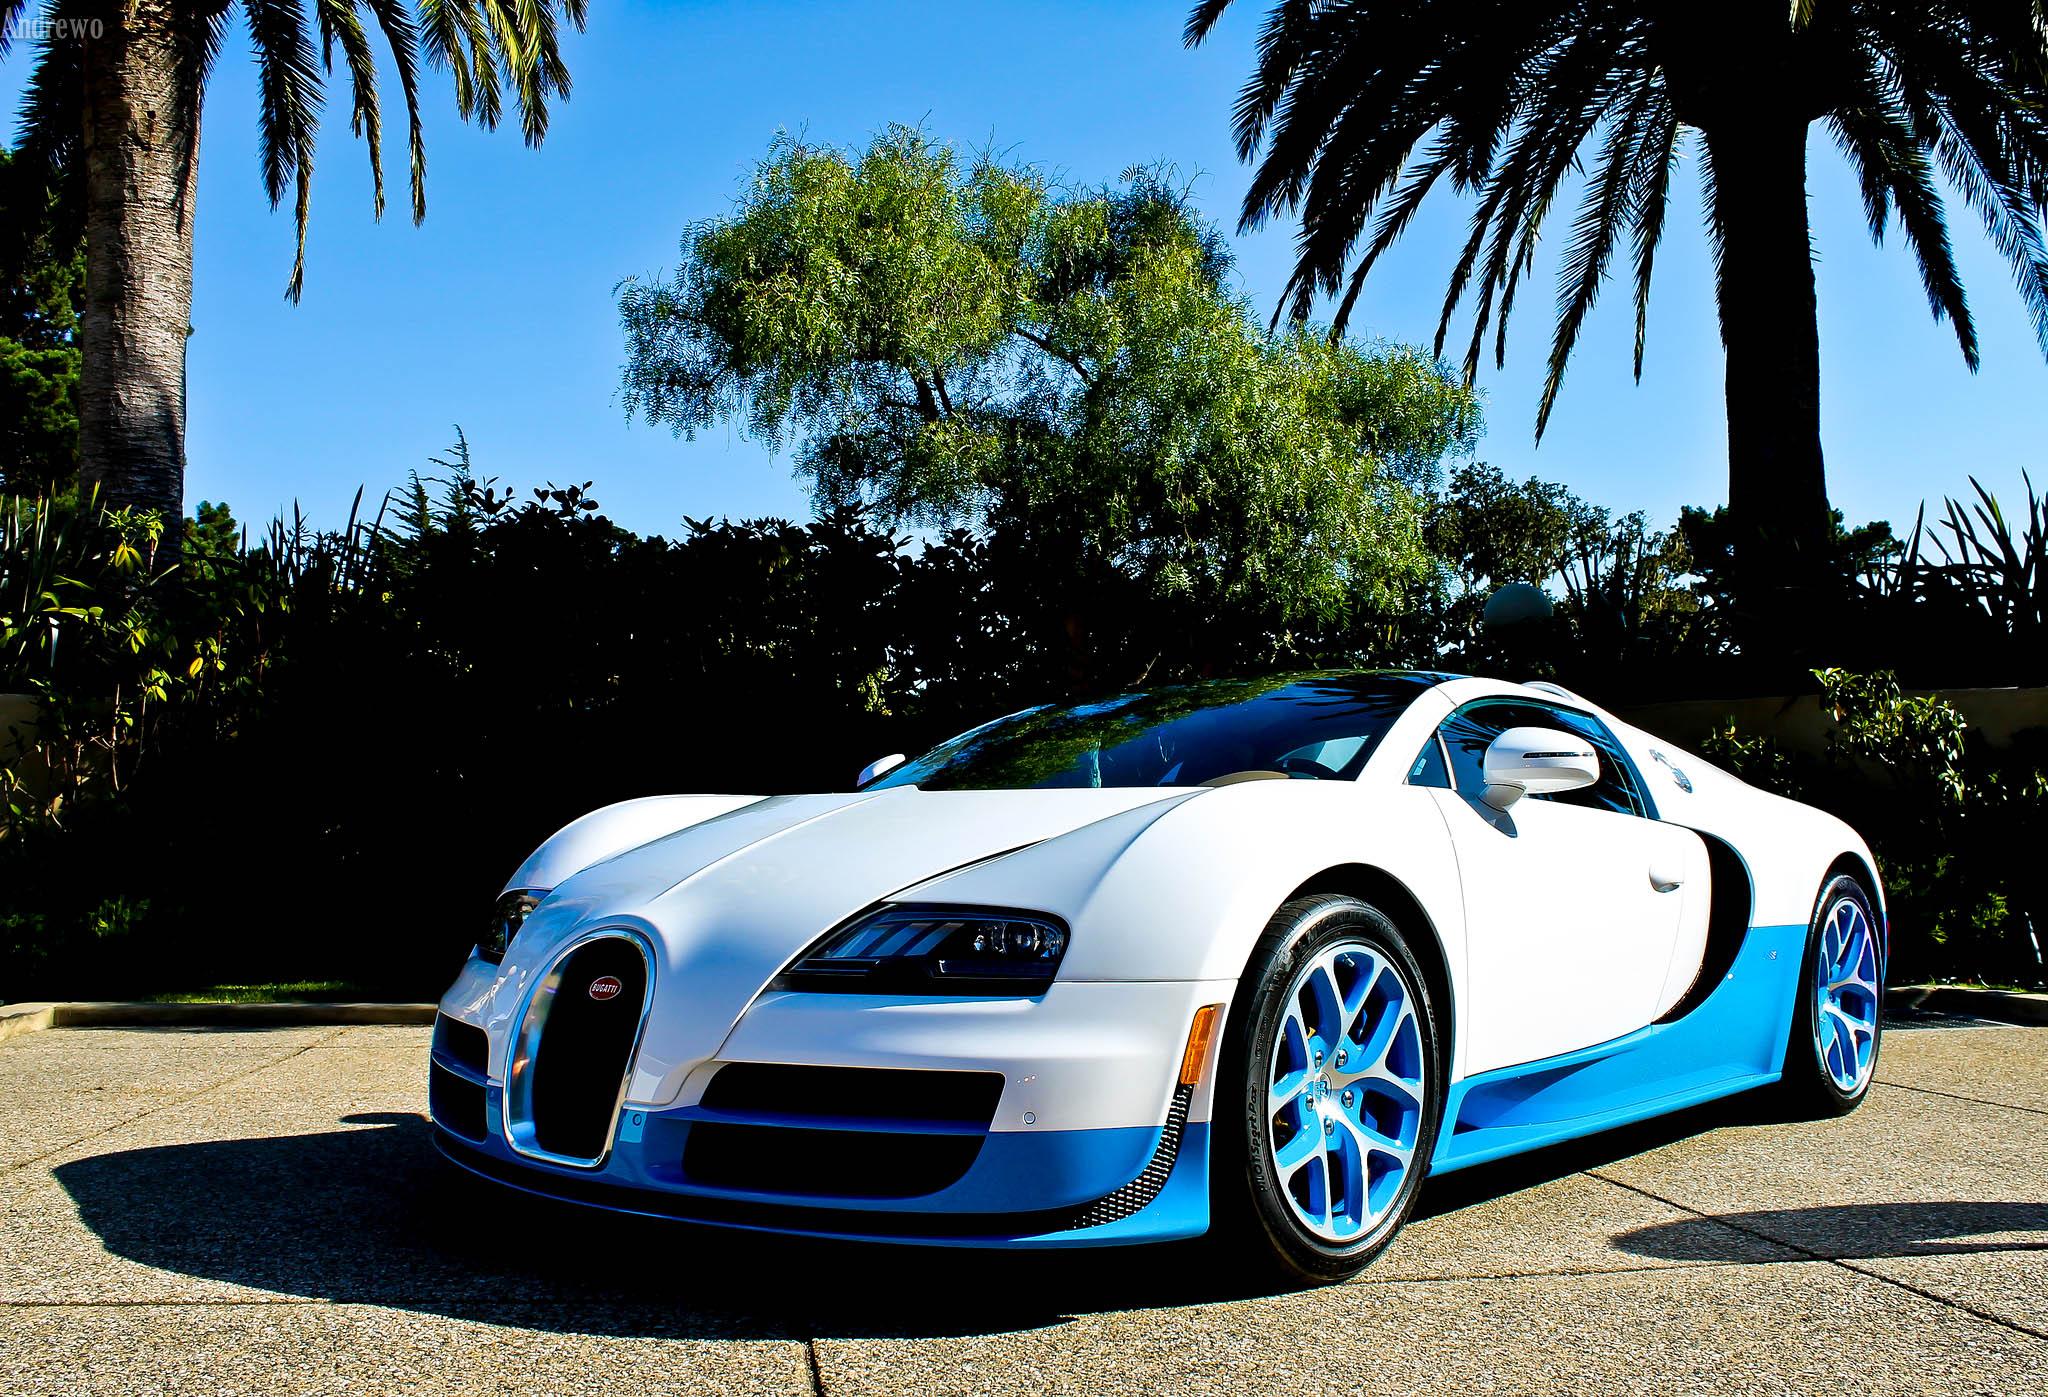 Bugatti Veyron Hd Wallpapers 1080p 2048x1397 Download Hd Wallpaper Wallpapertip